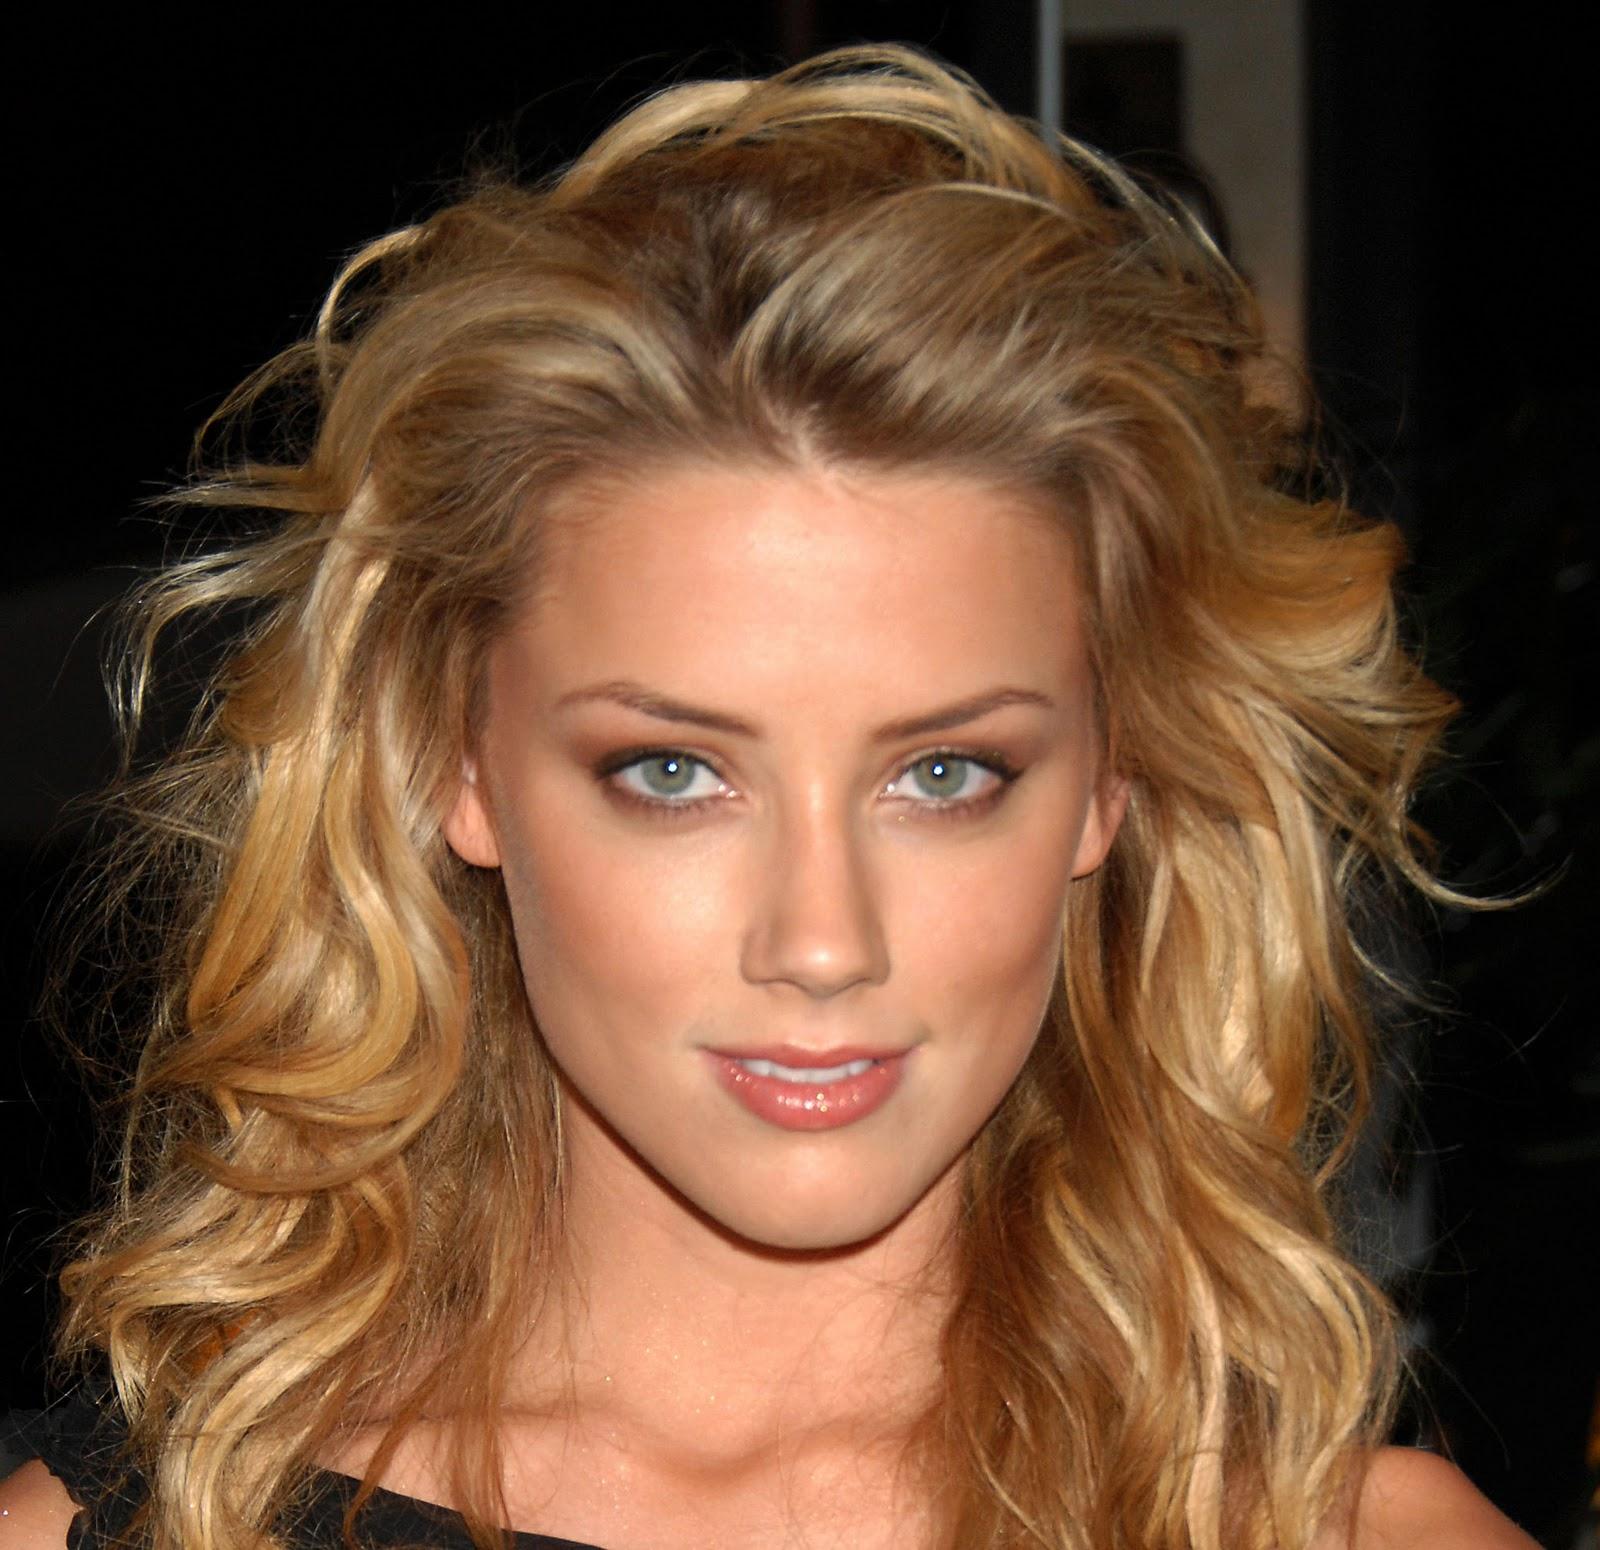 http://4.bp.blogspot.com/_AaNmlEmRD9Y/TTrrNZmqhfI/AAAAAAAAAww/bUYiNLyg7aI/s1600/Amber+Heard+02.jpg